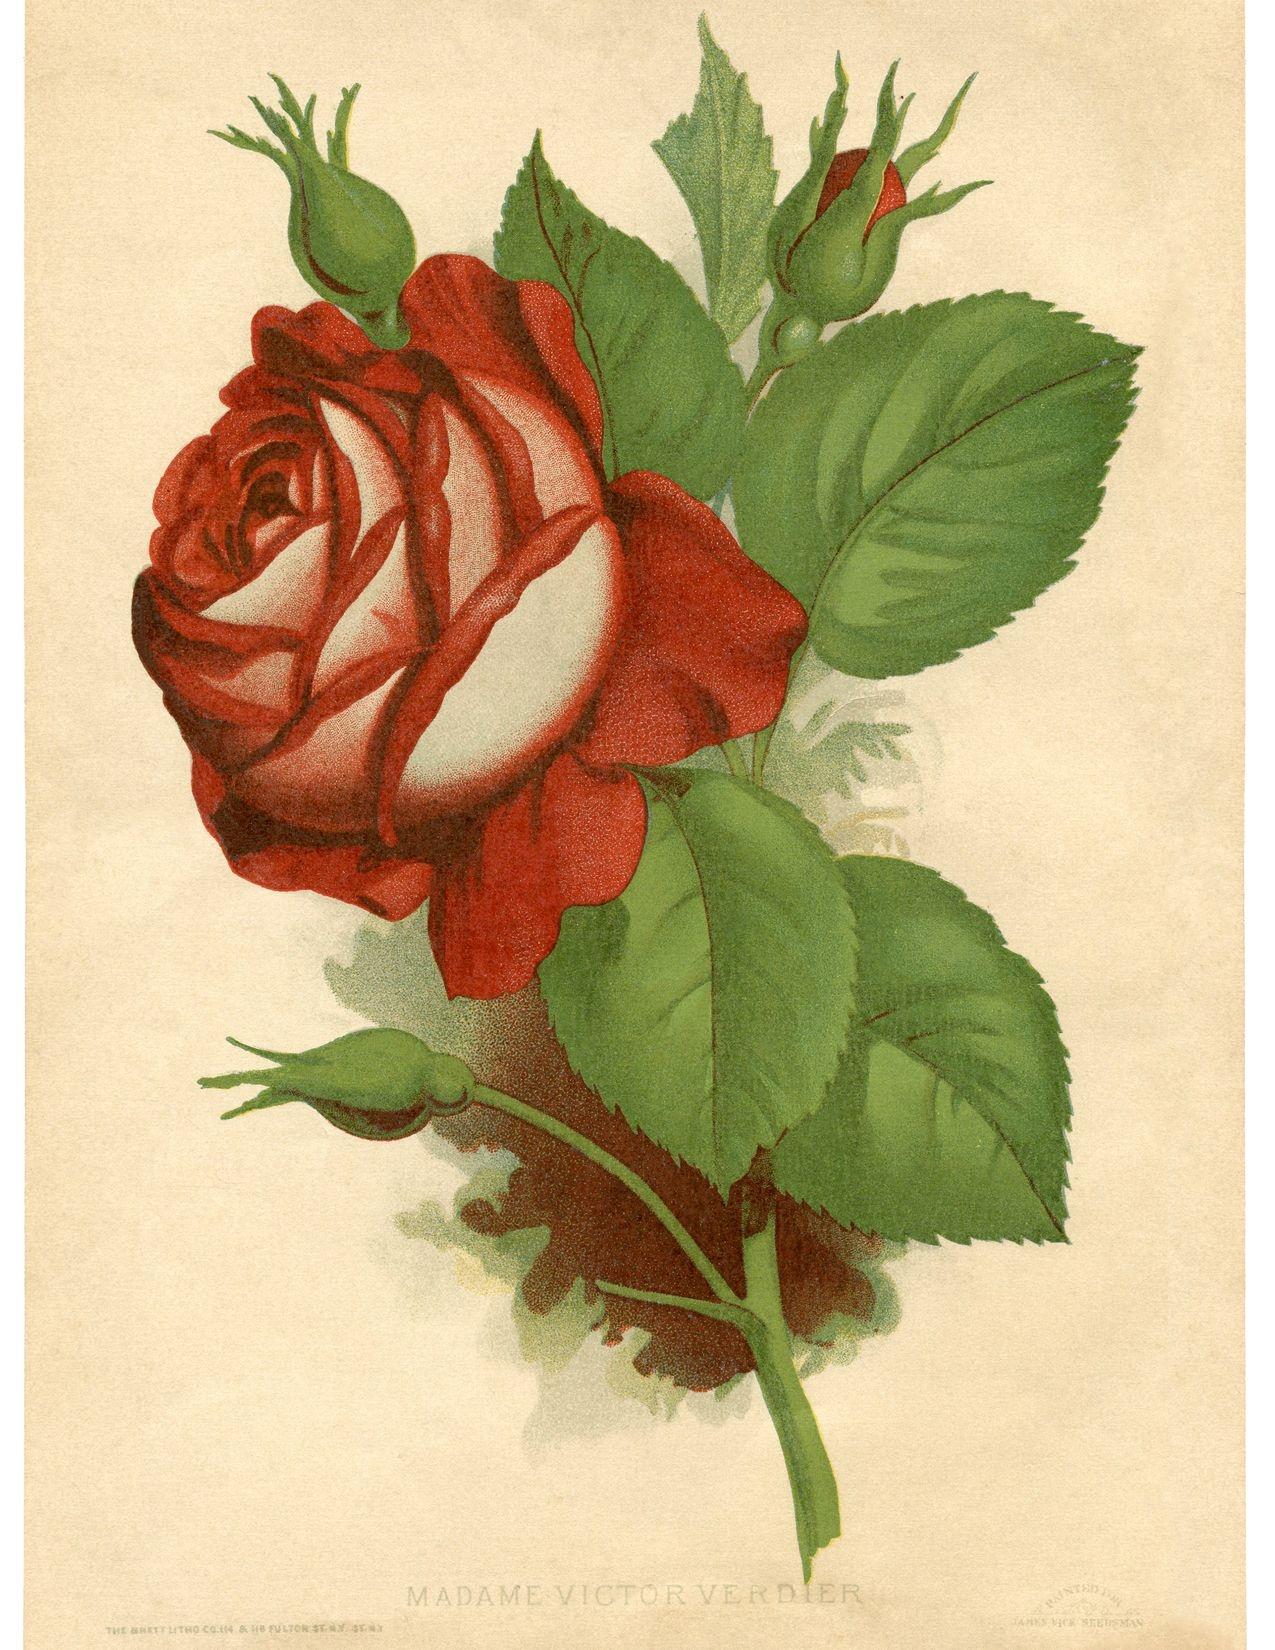 50 Free Wall Art Printables! | Images | Printable Wall Art - Free Printable Roses